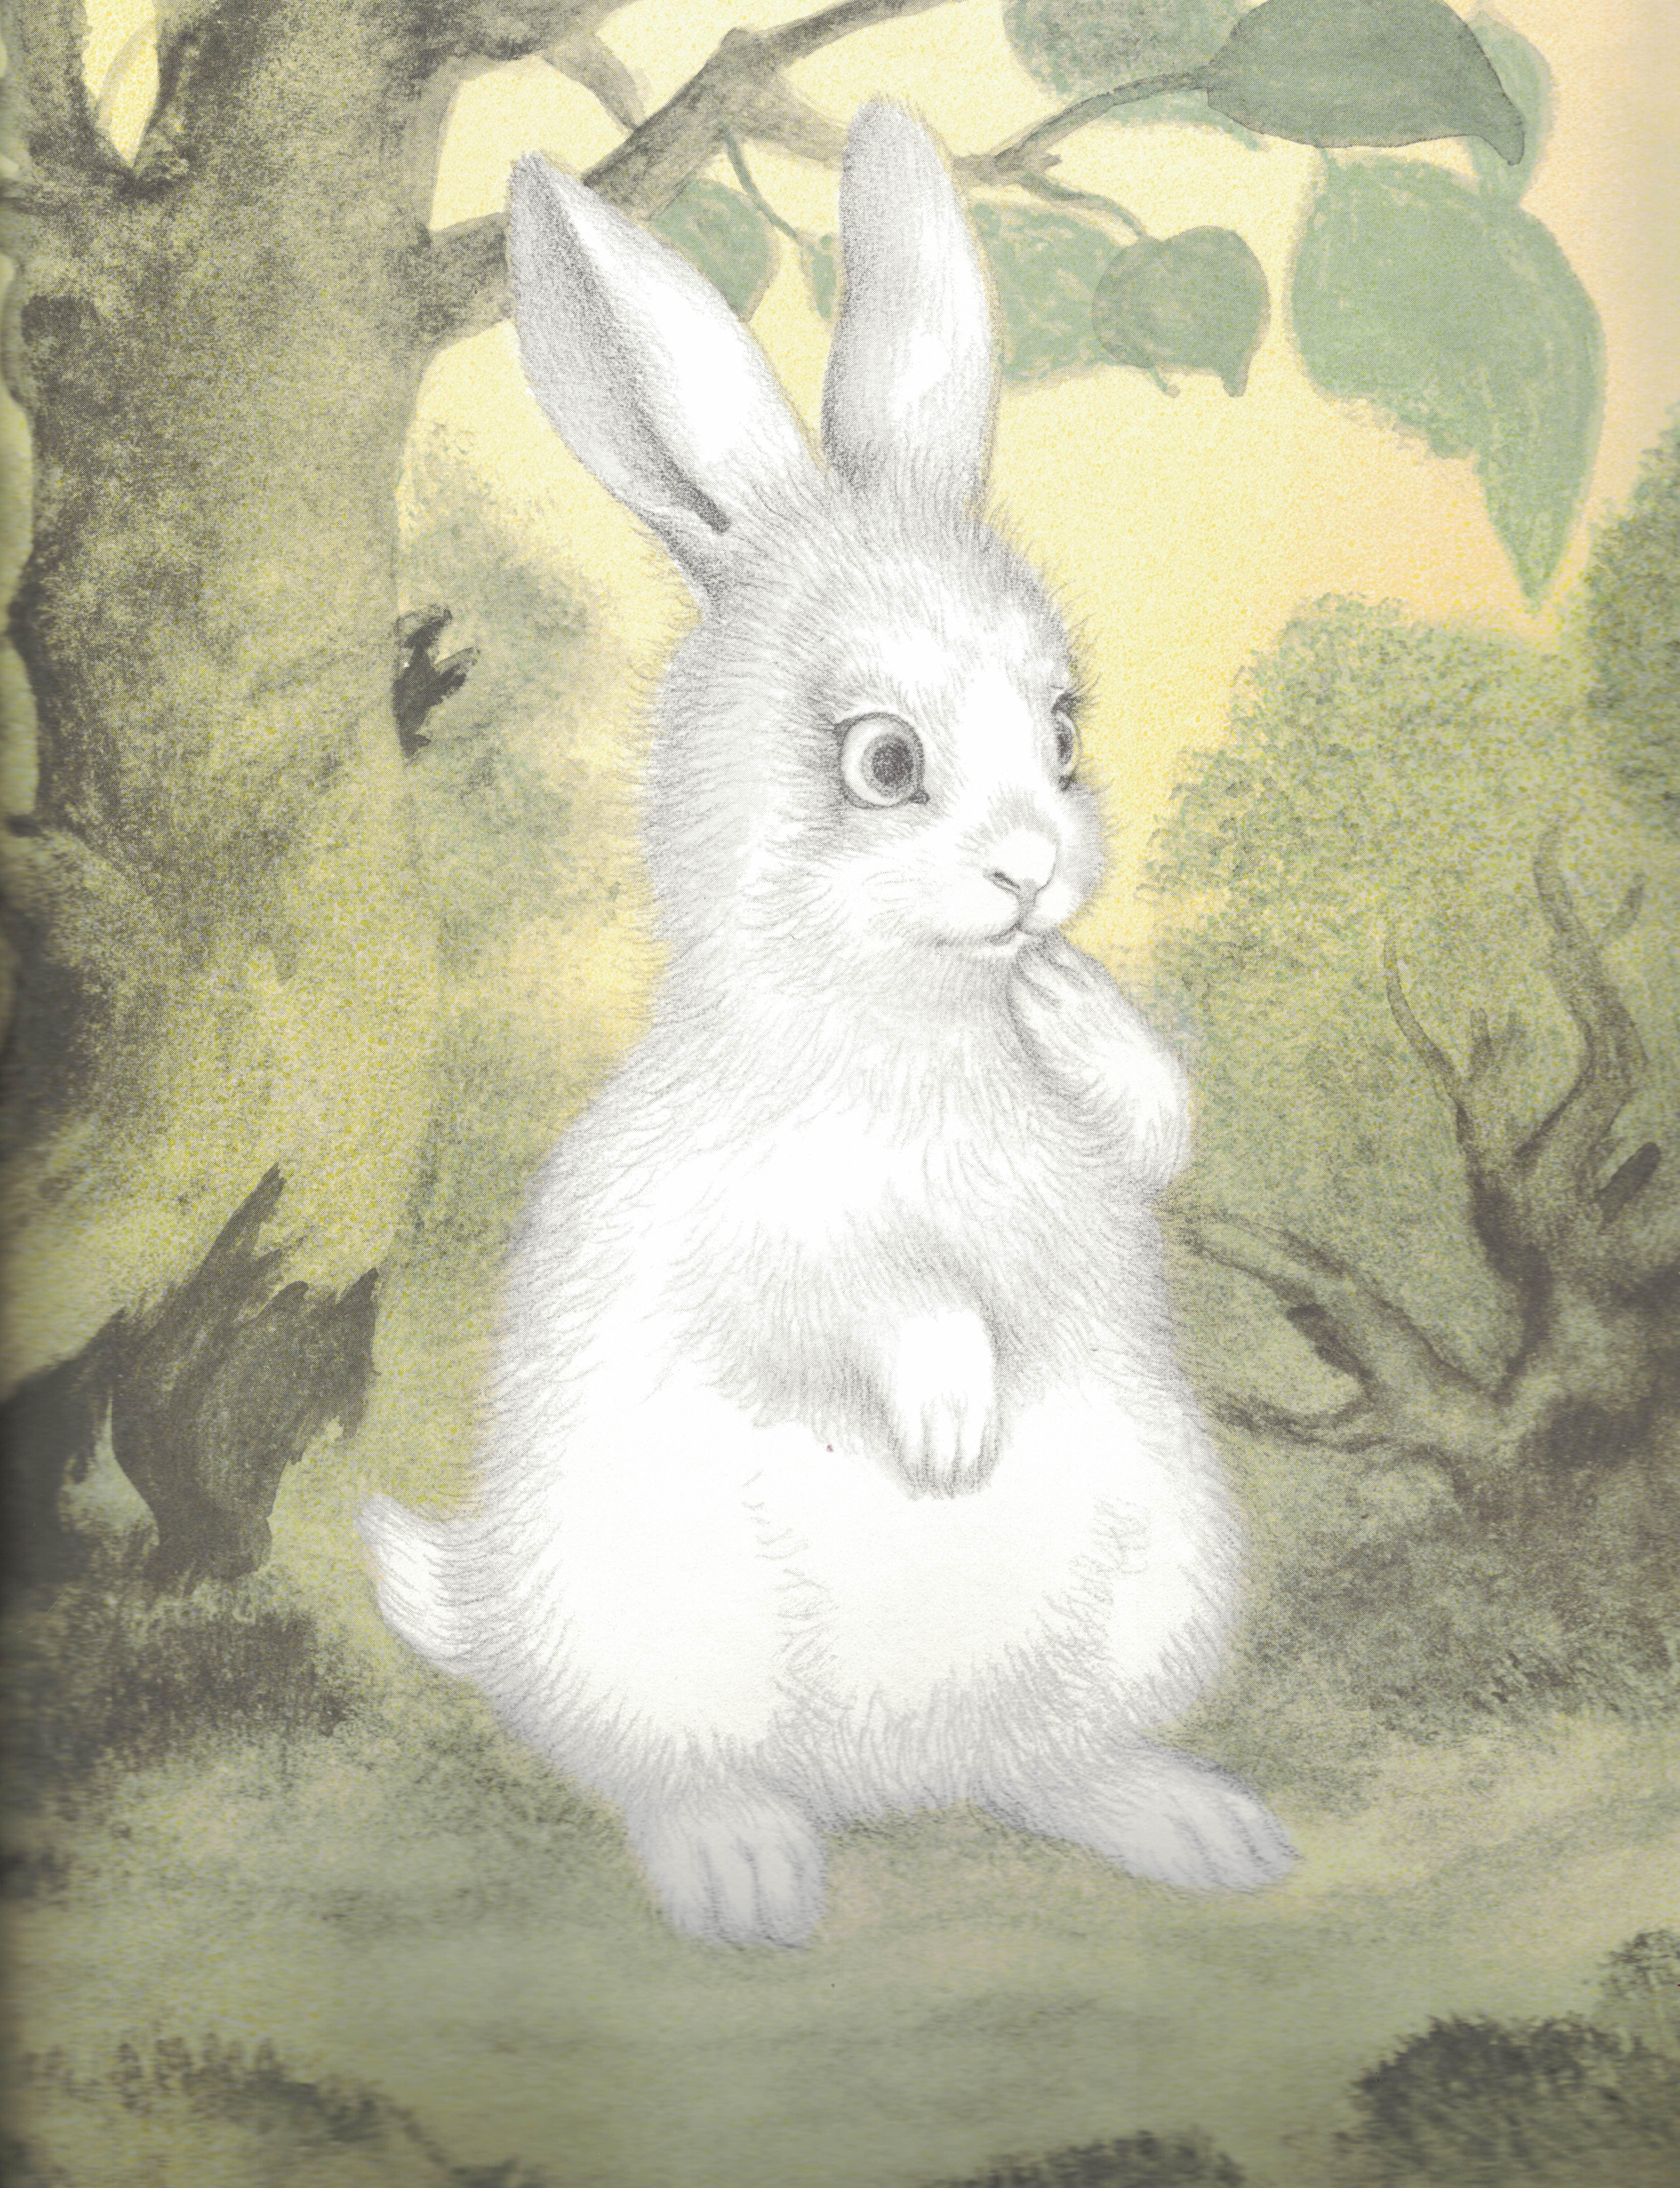 Cat bunny interracial love